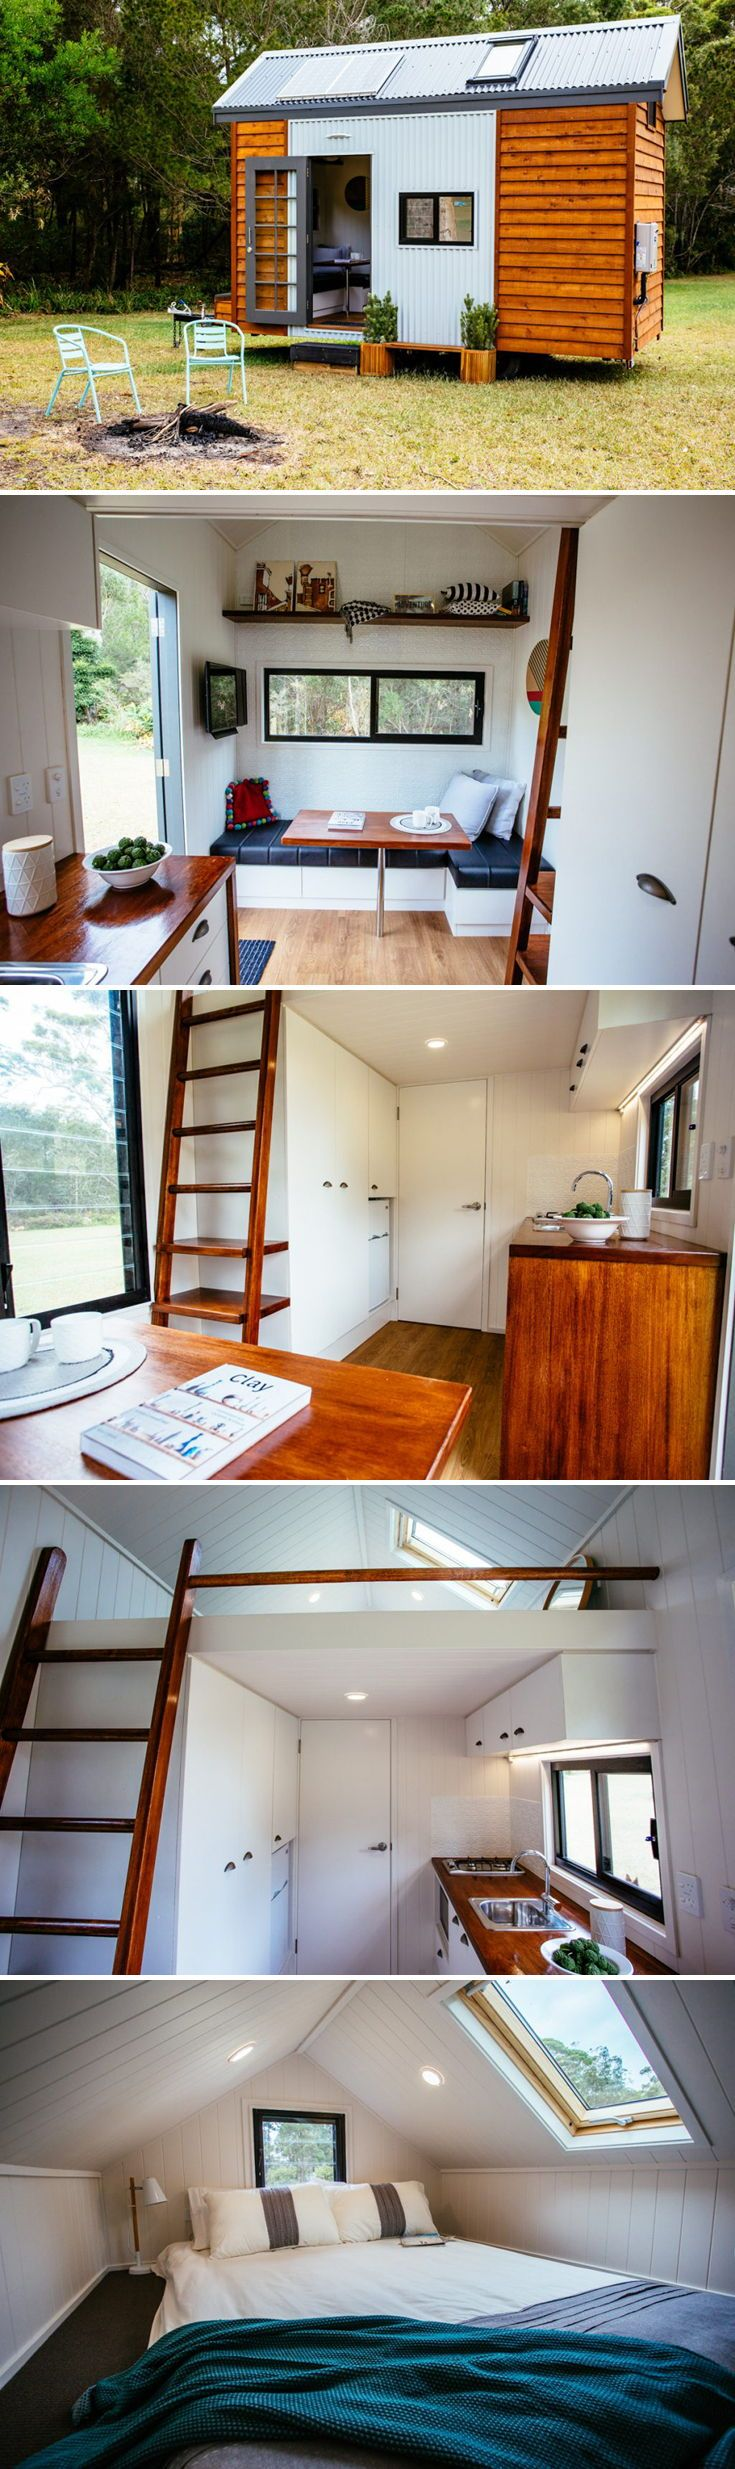 300 Tiny Homes Camping Caravaning Ideen Minihaus Wohne Im Tiny House Kleine Hauspflanzen